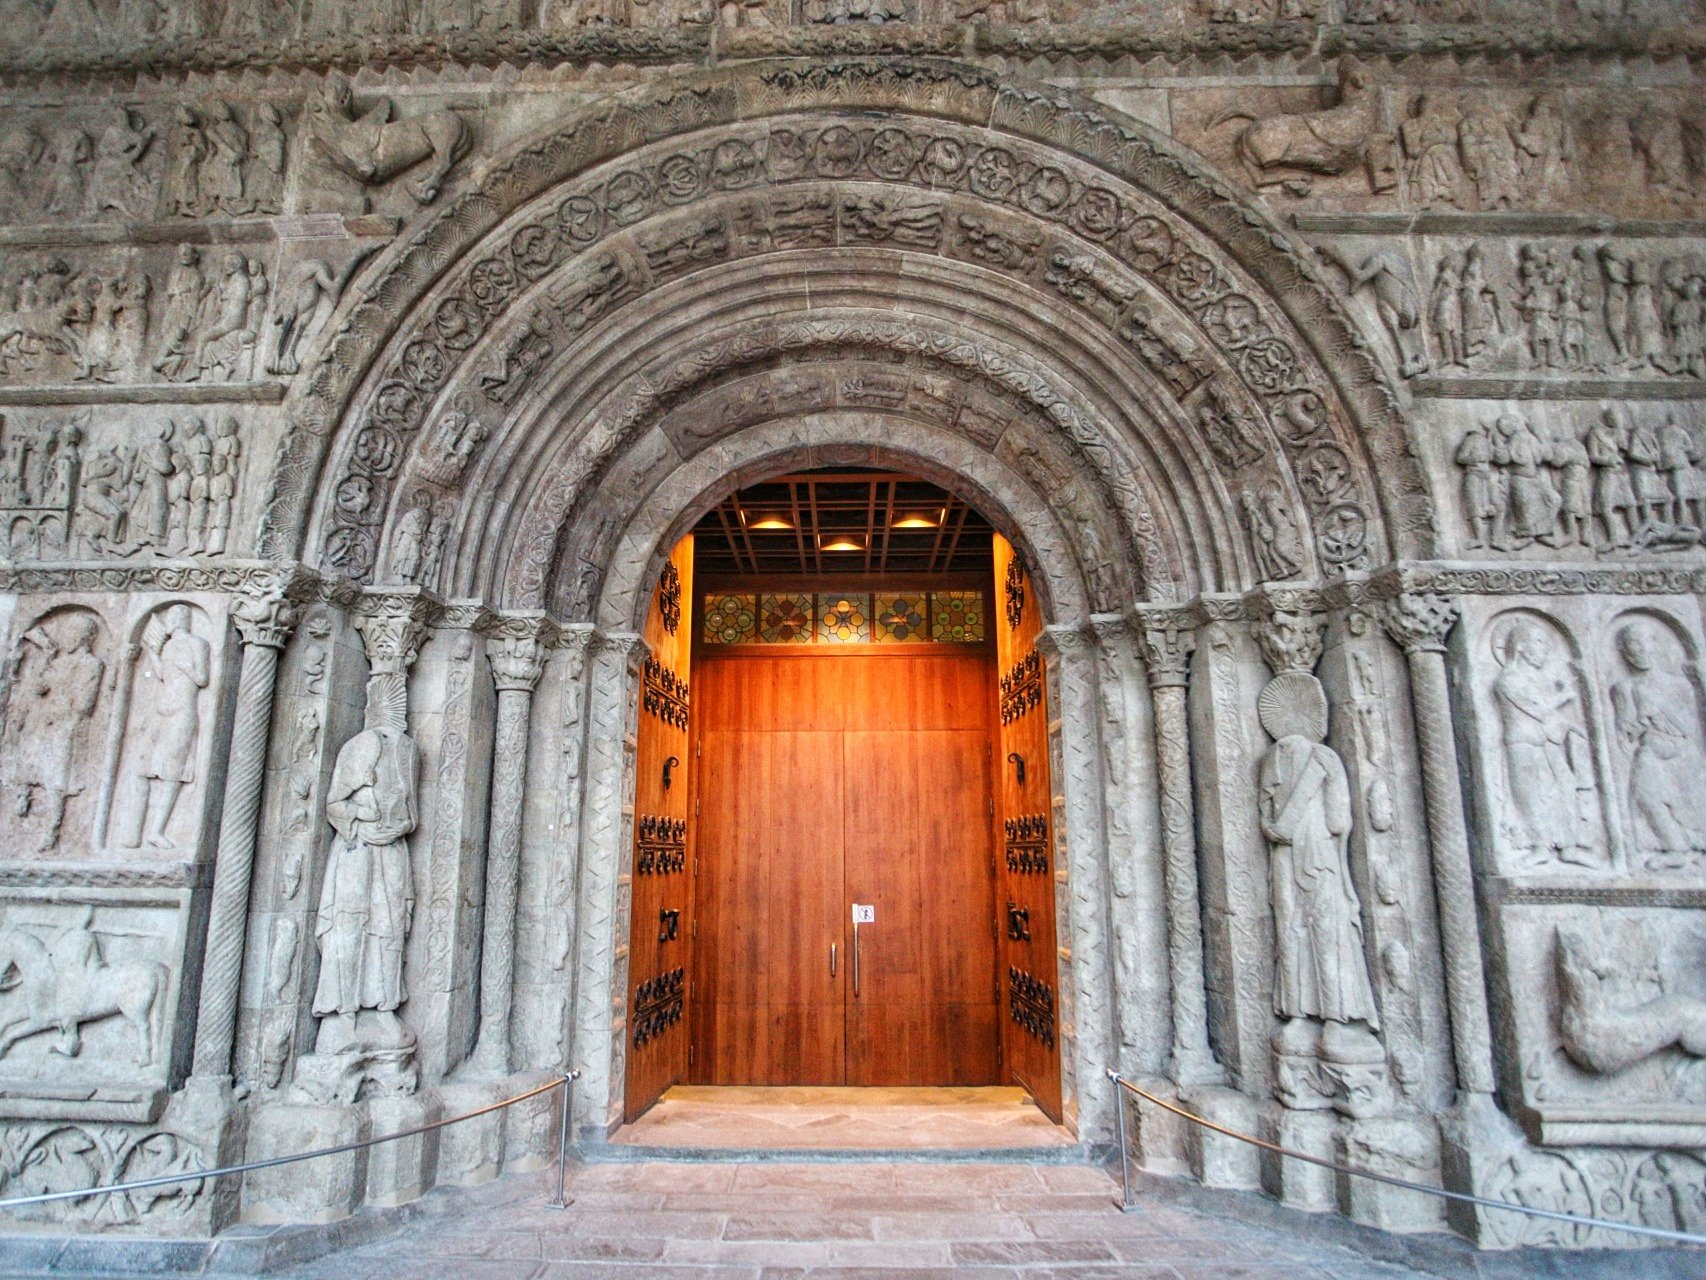 The beautiful Monastery of Santa Maria de Ripoll! #inPyrenees #visitPyrenees https://t.co/a7aldFCWlI